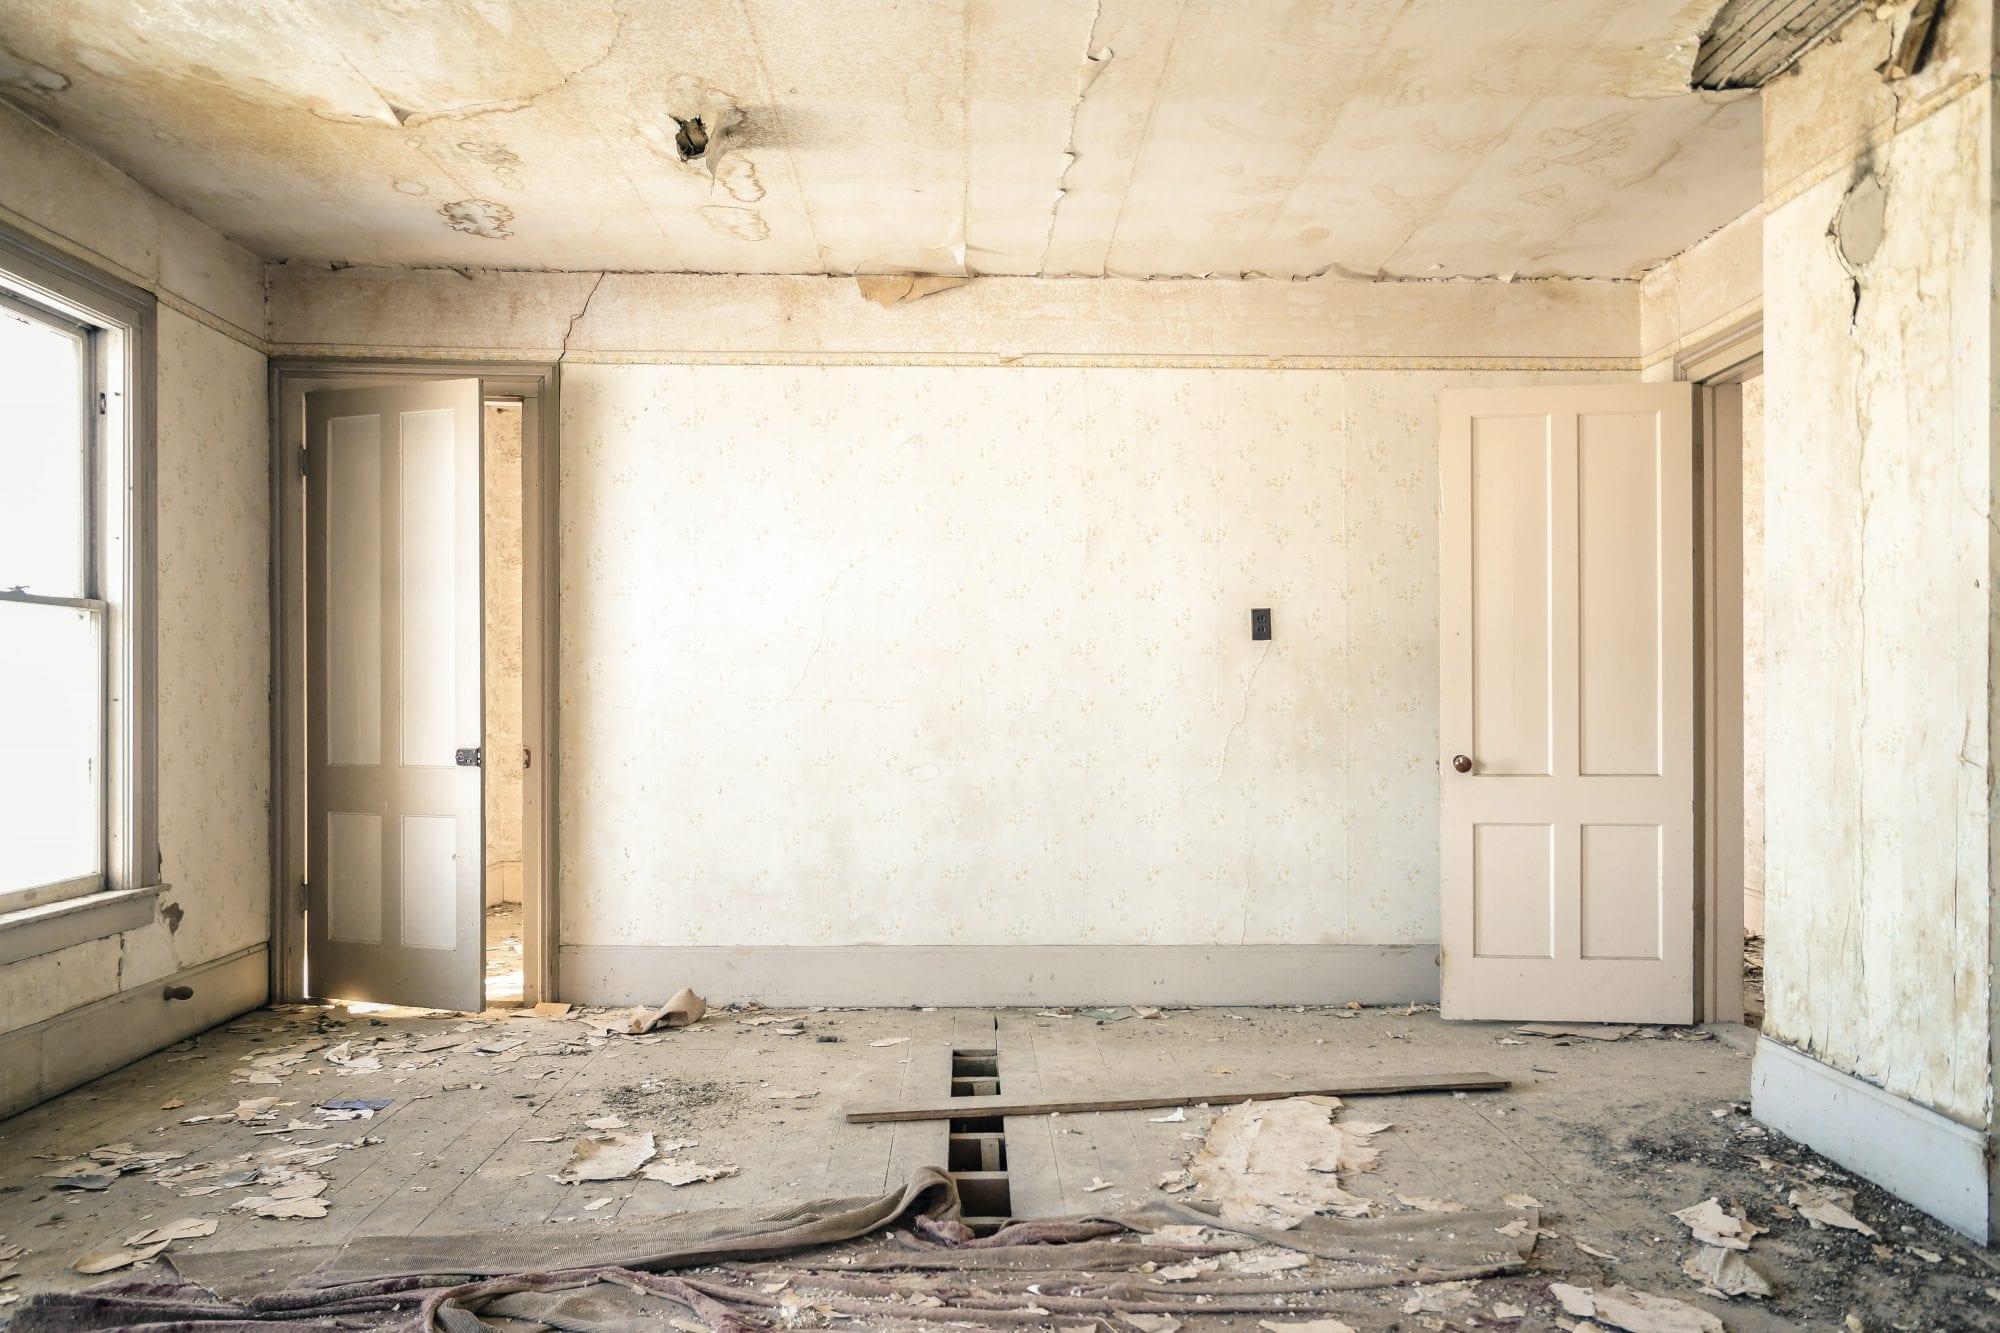 managing renovation stress